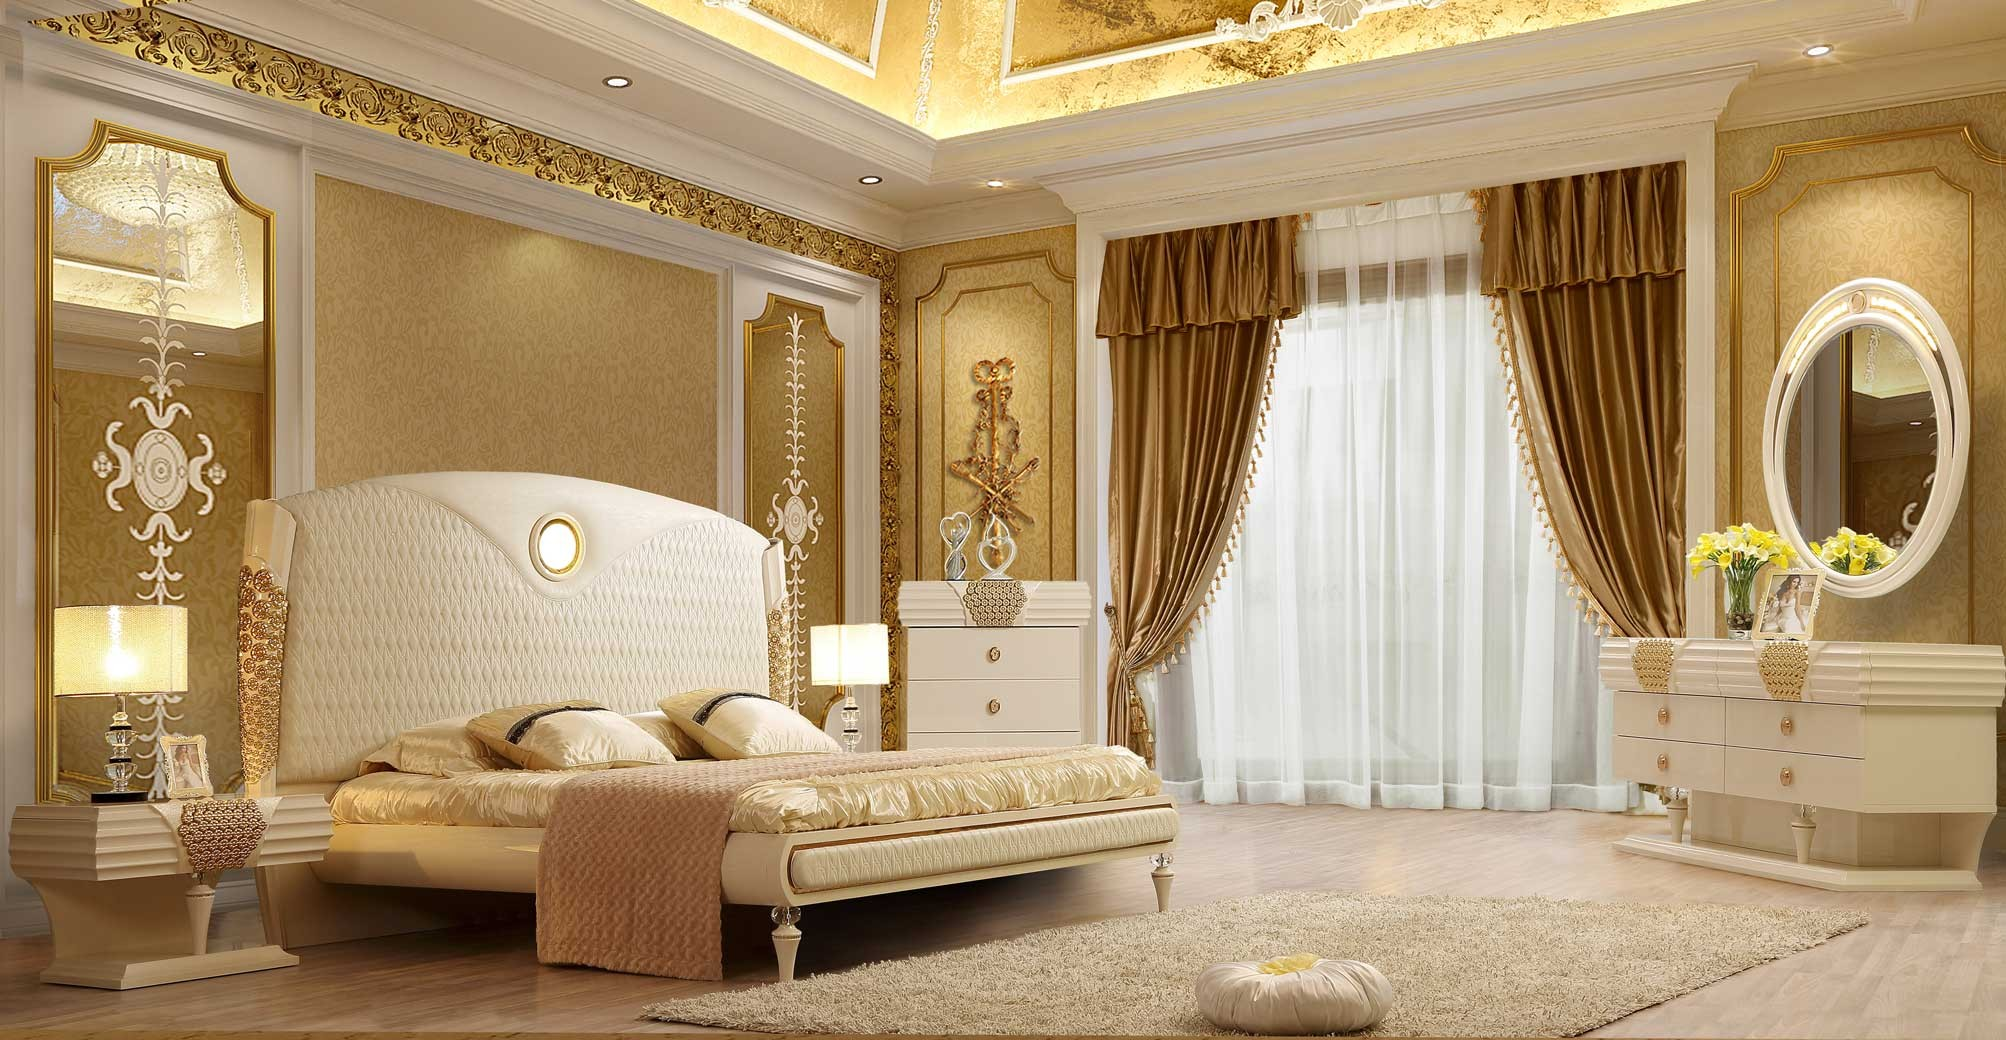 Hd 901 Homey Design Bedroom Set Victorian European